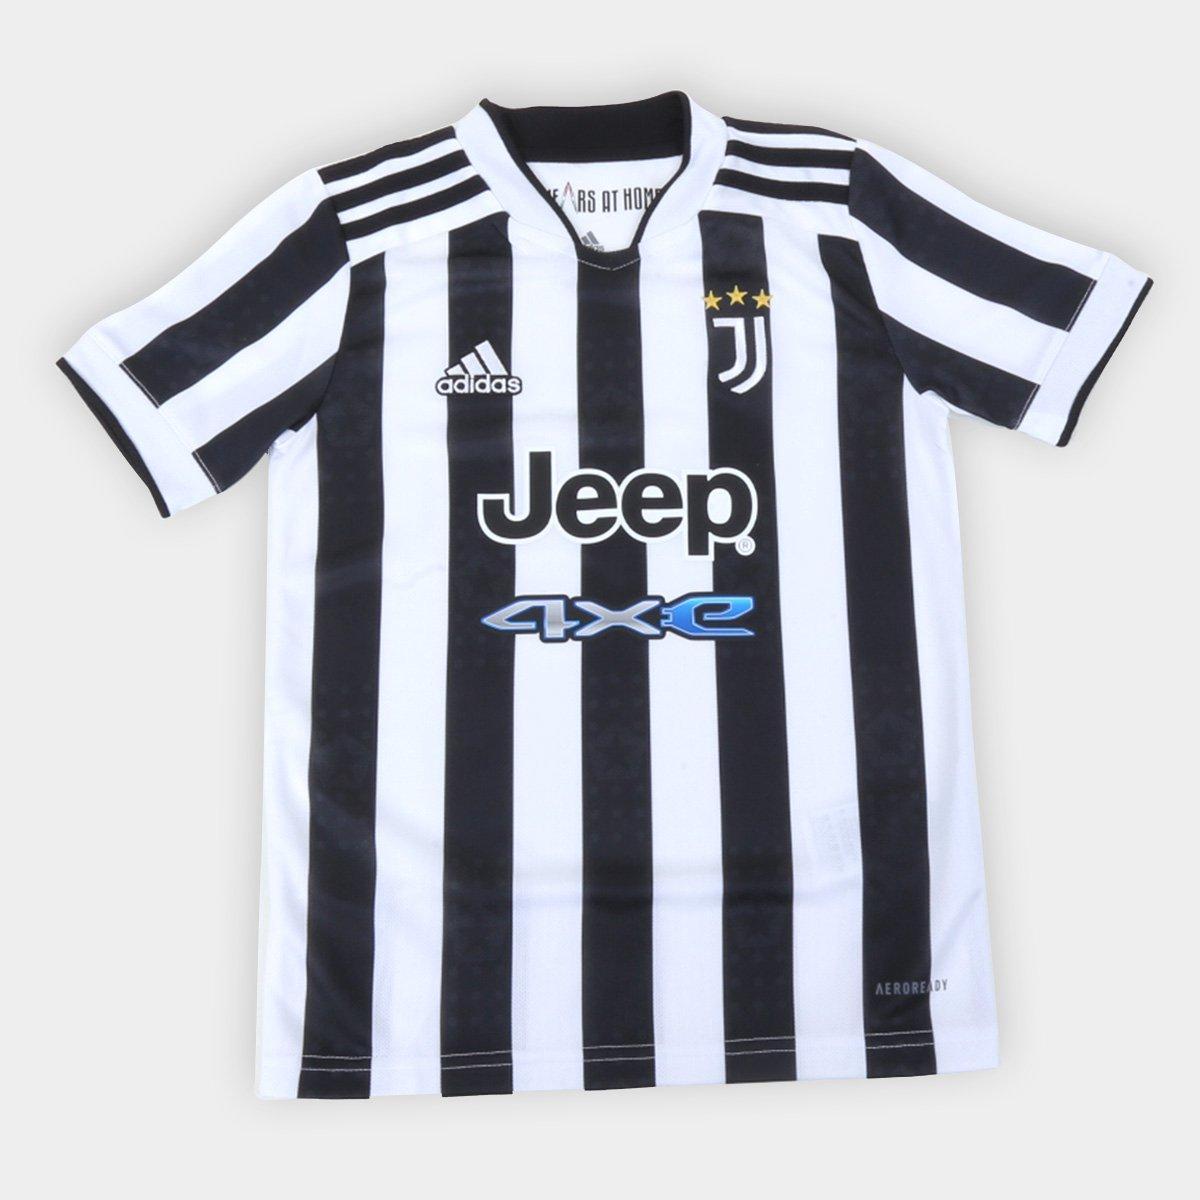 Camisa Juventus Juvenil Home 21/22 s/n° Torcedor Adidas